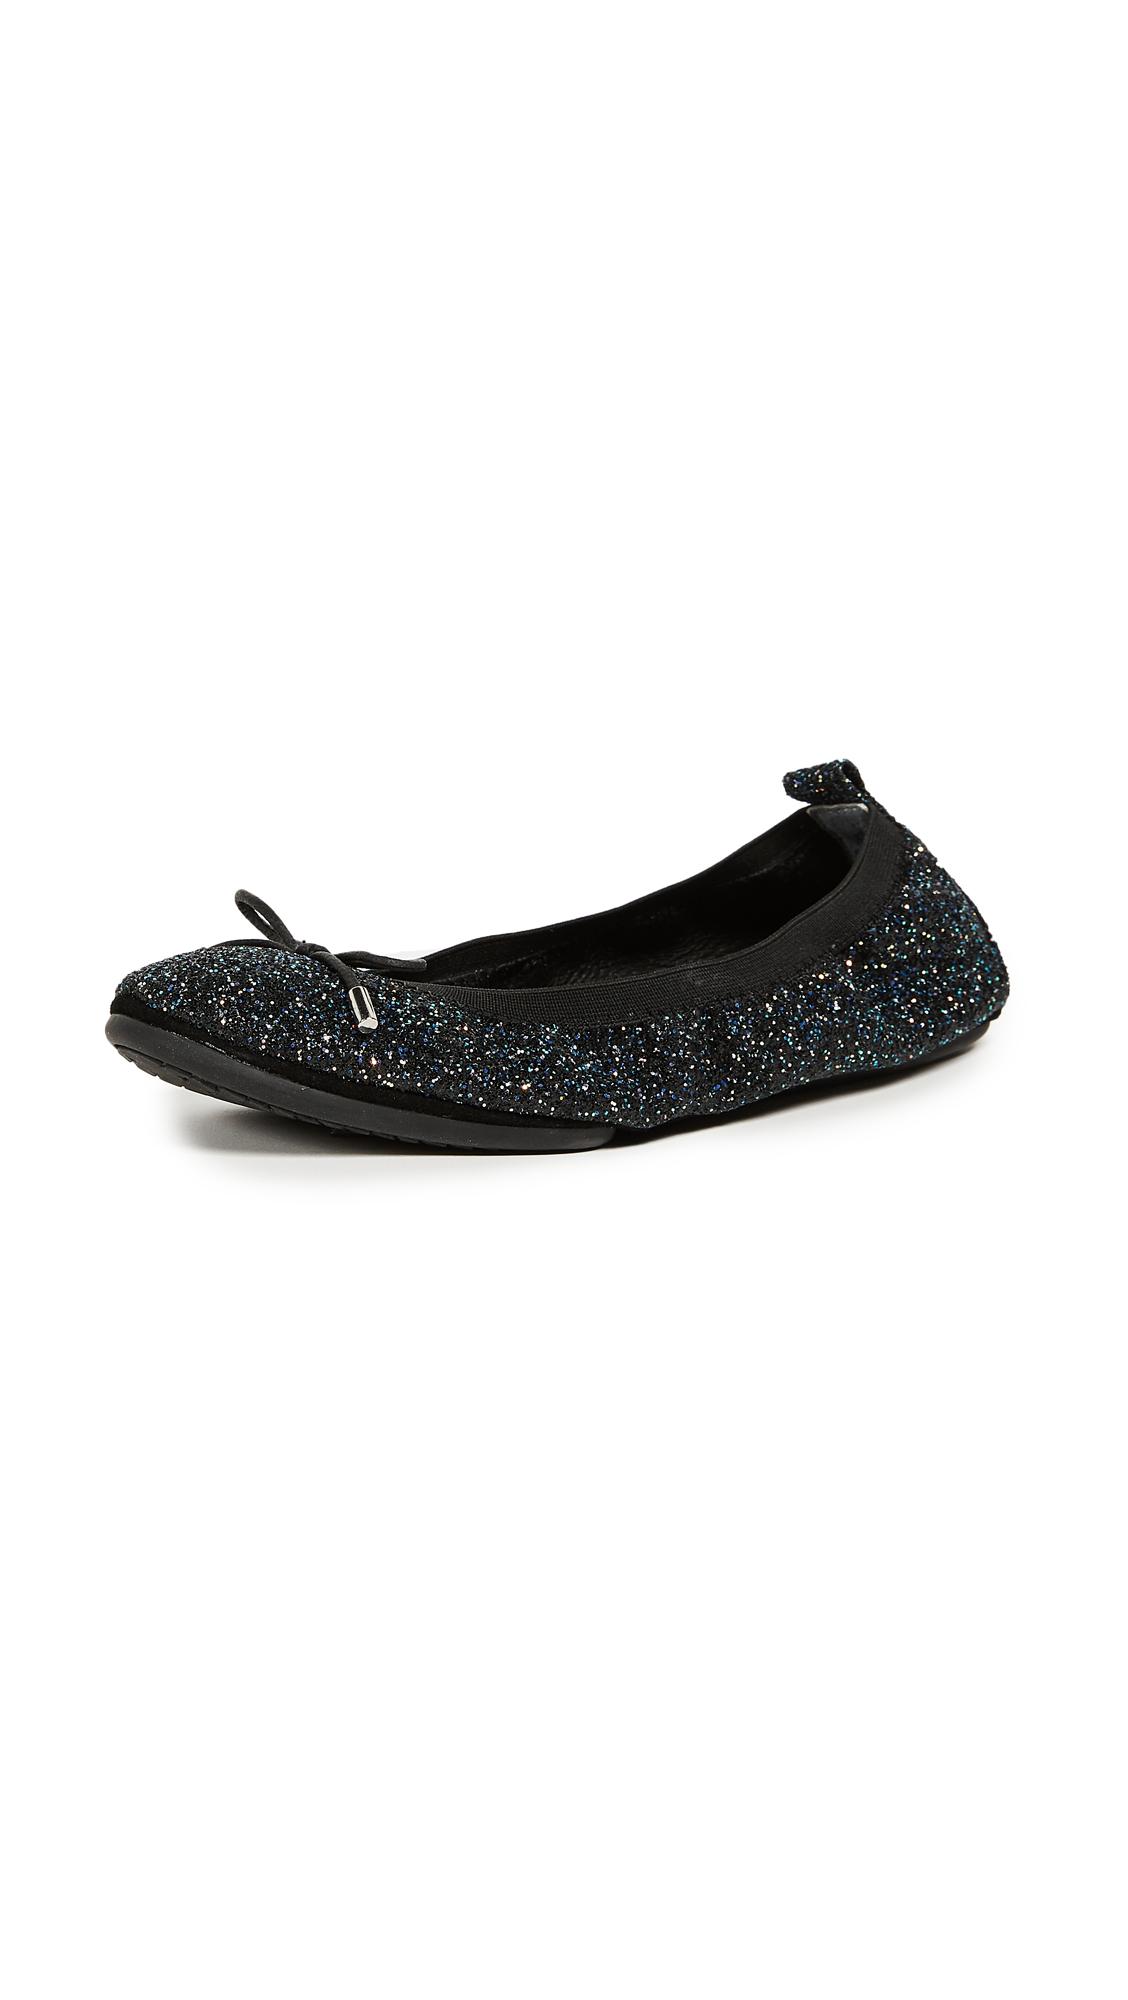 Yosi Samra Sandrine Glitter Flats - Black